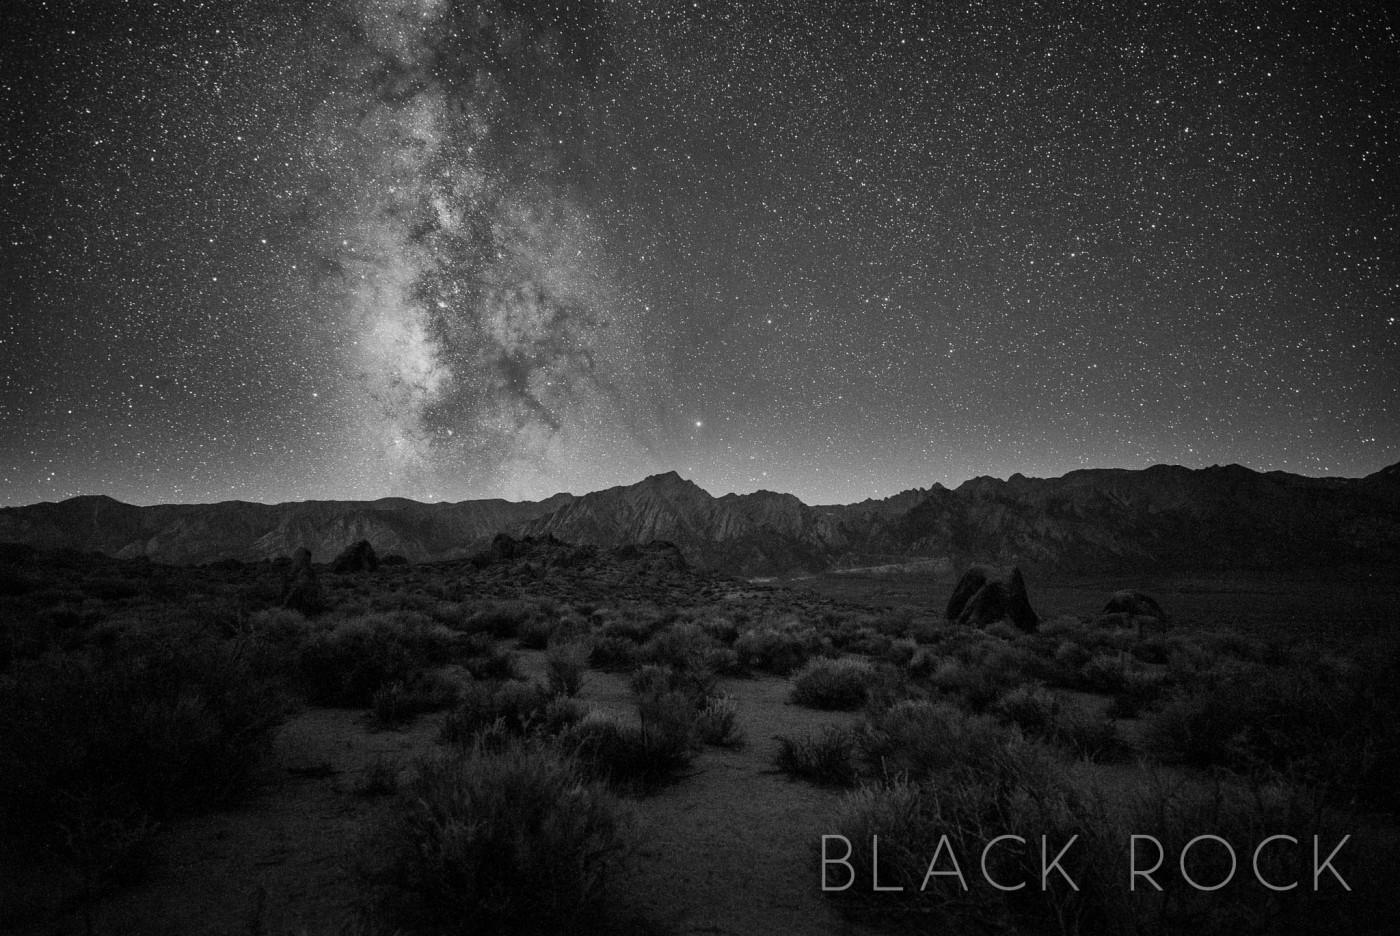 blackrock-milky-way-astrophotography-lonely-speck-lightroom-preset-1